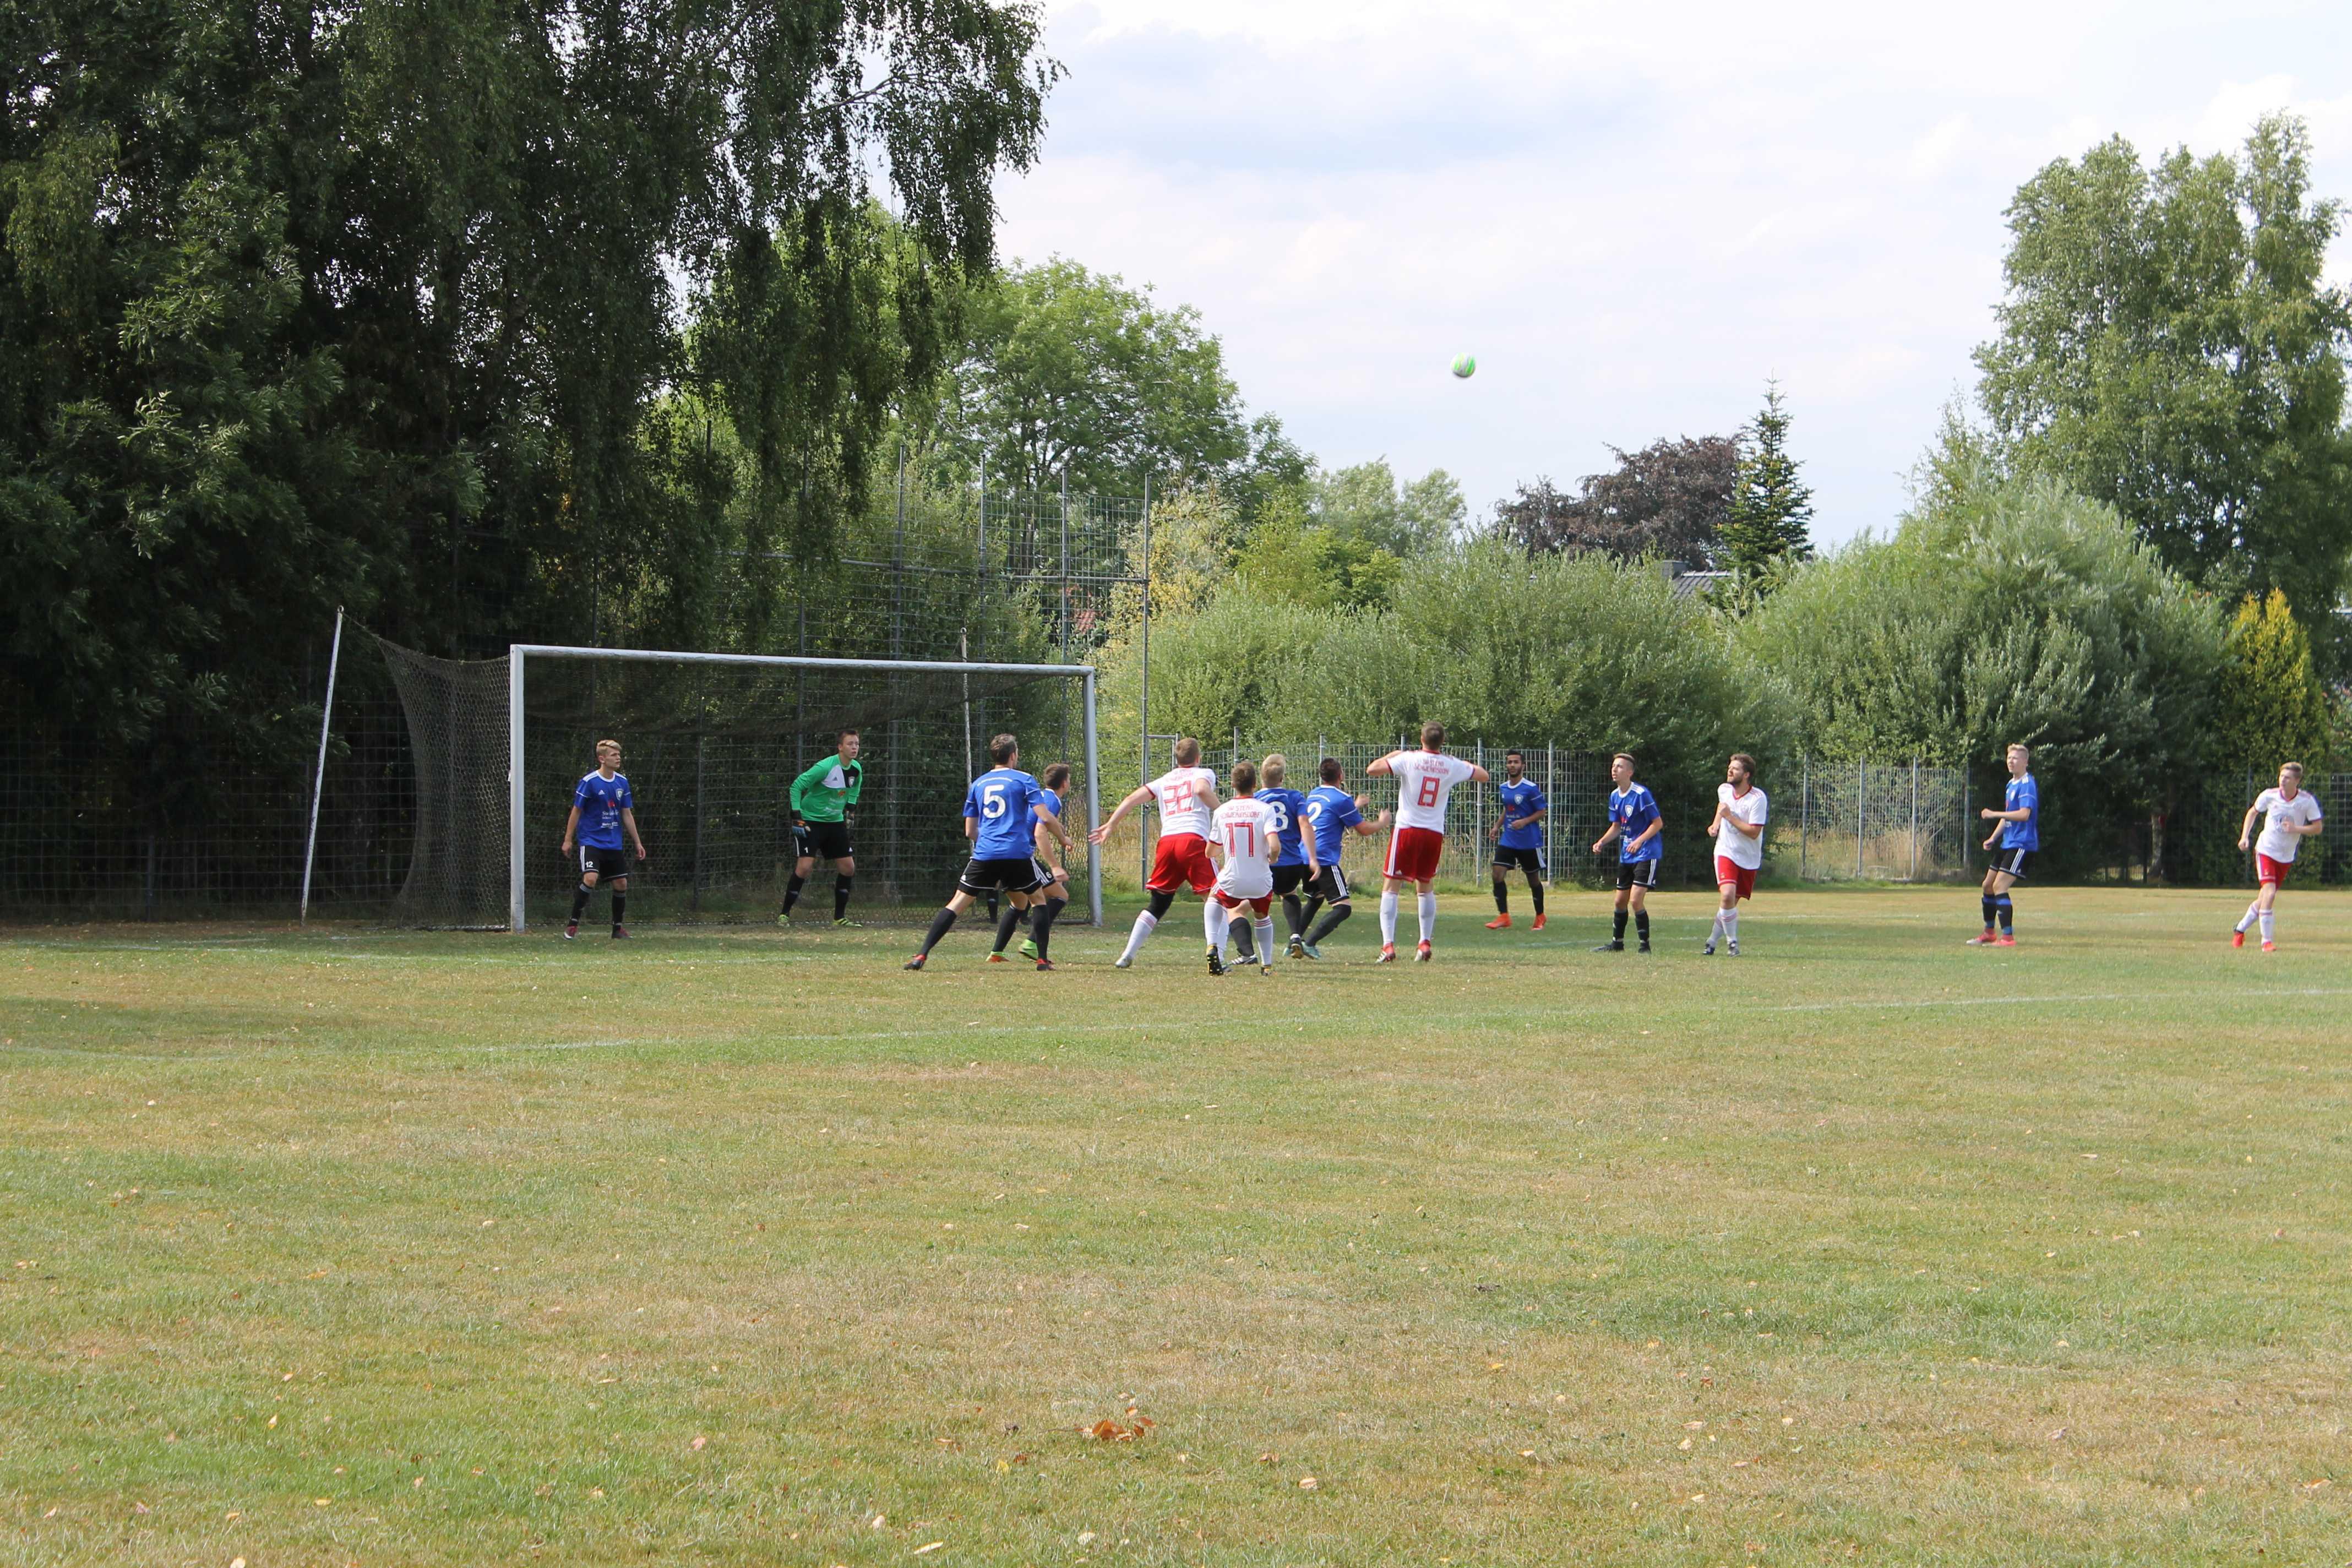 2018-07-29 Sportwoche - Sportpicknick & Football & Fußball (41)